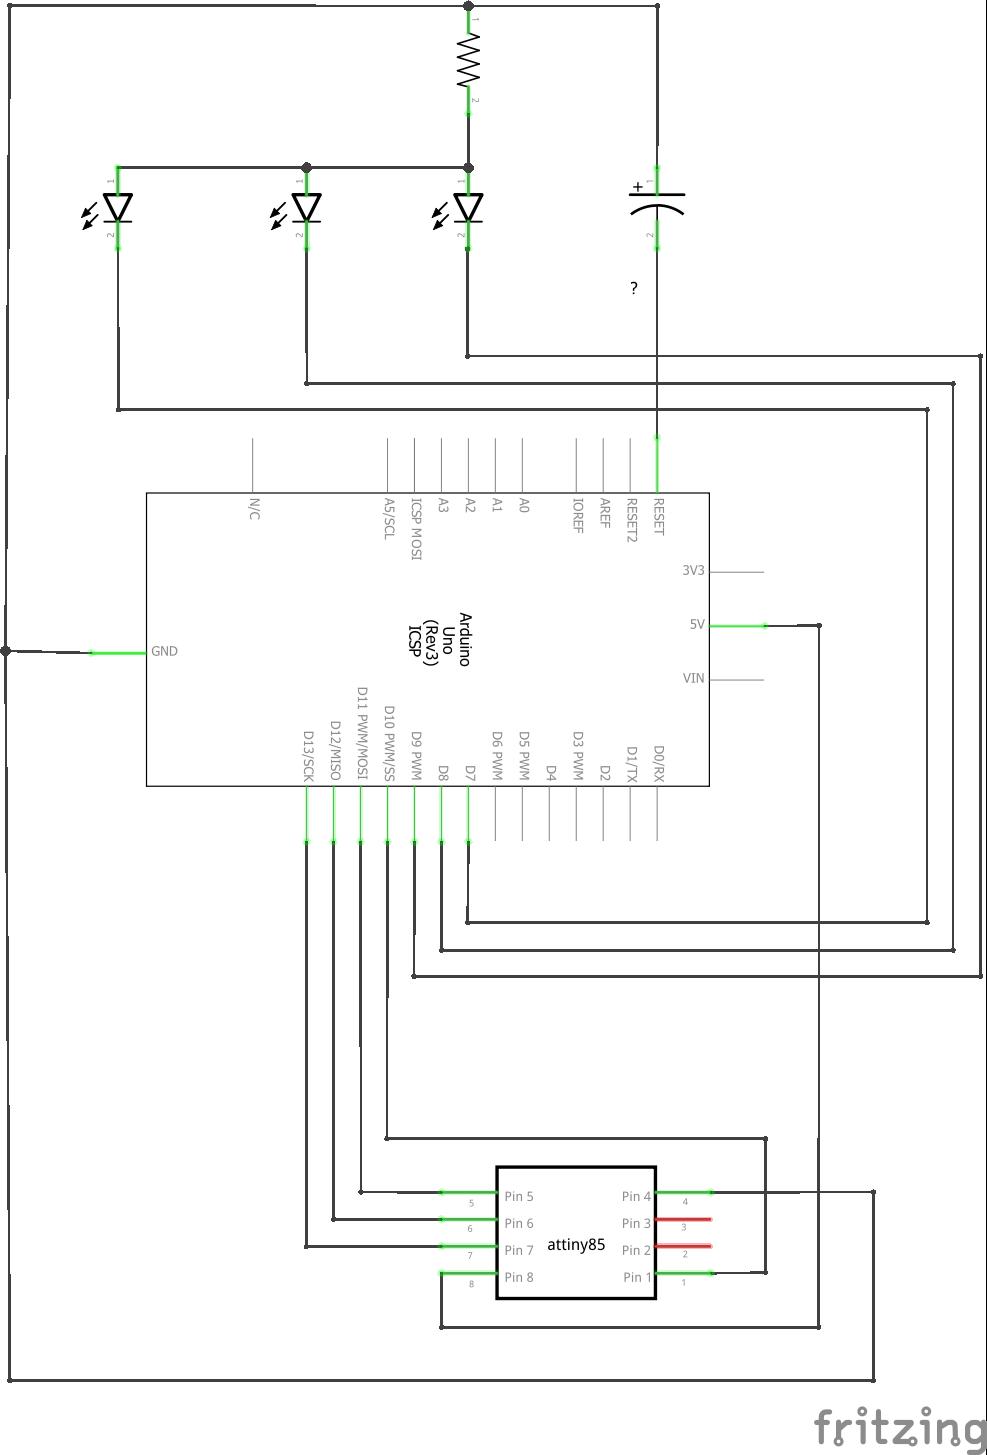 Programming the ATtiny85 (Using an Arduino Uno) - ster.io on arduino amplifier, arduino dmx controller, flash circuit schematic, mbed circuit schematic, arduino pcb layout, arduino transistor, iphone circuit schematic,